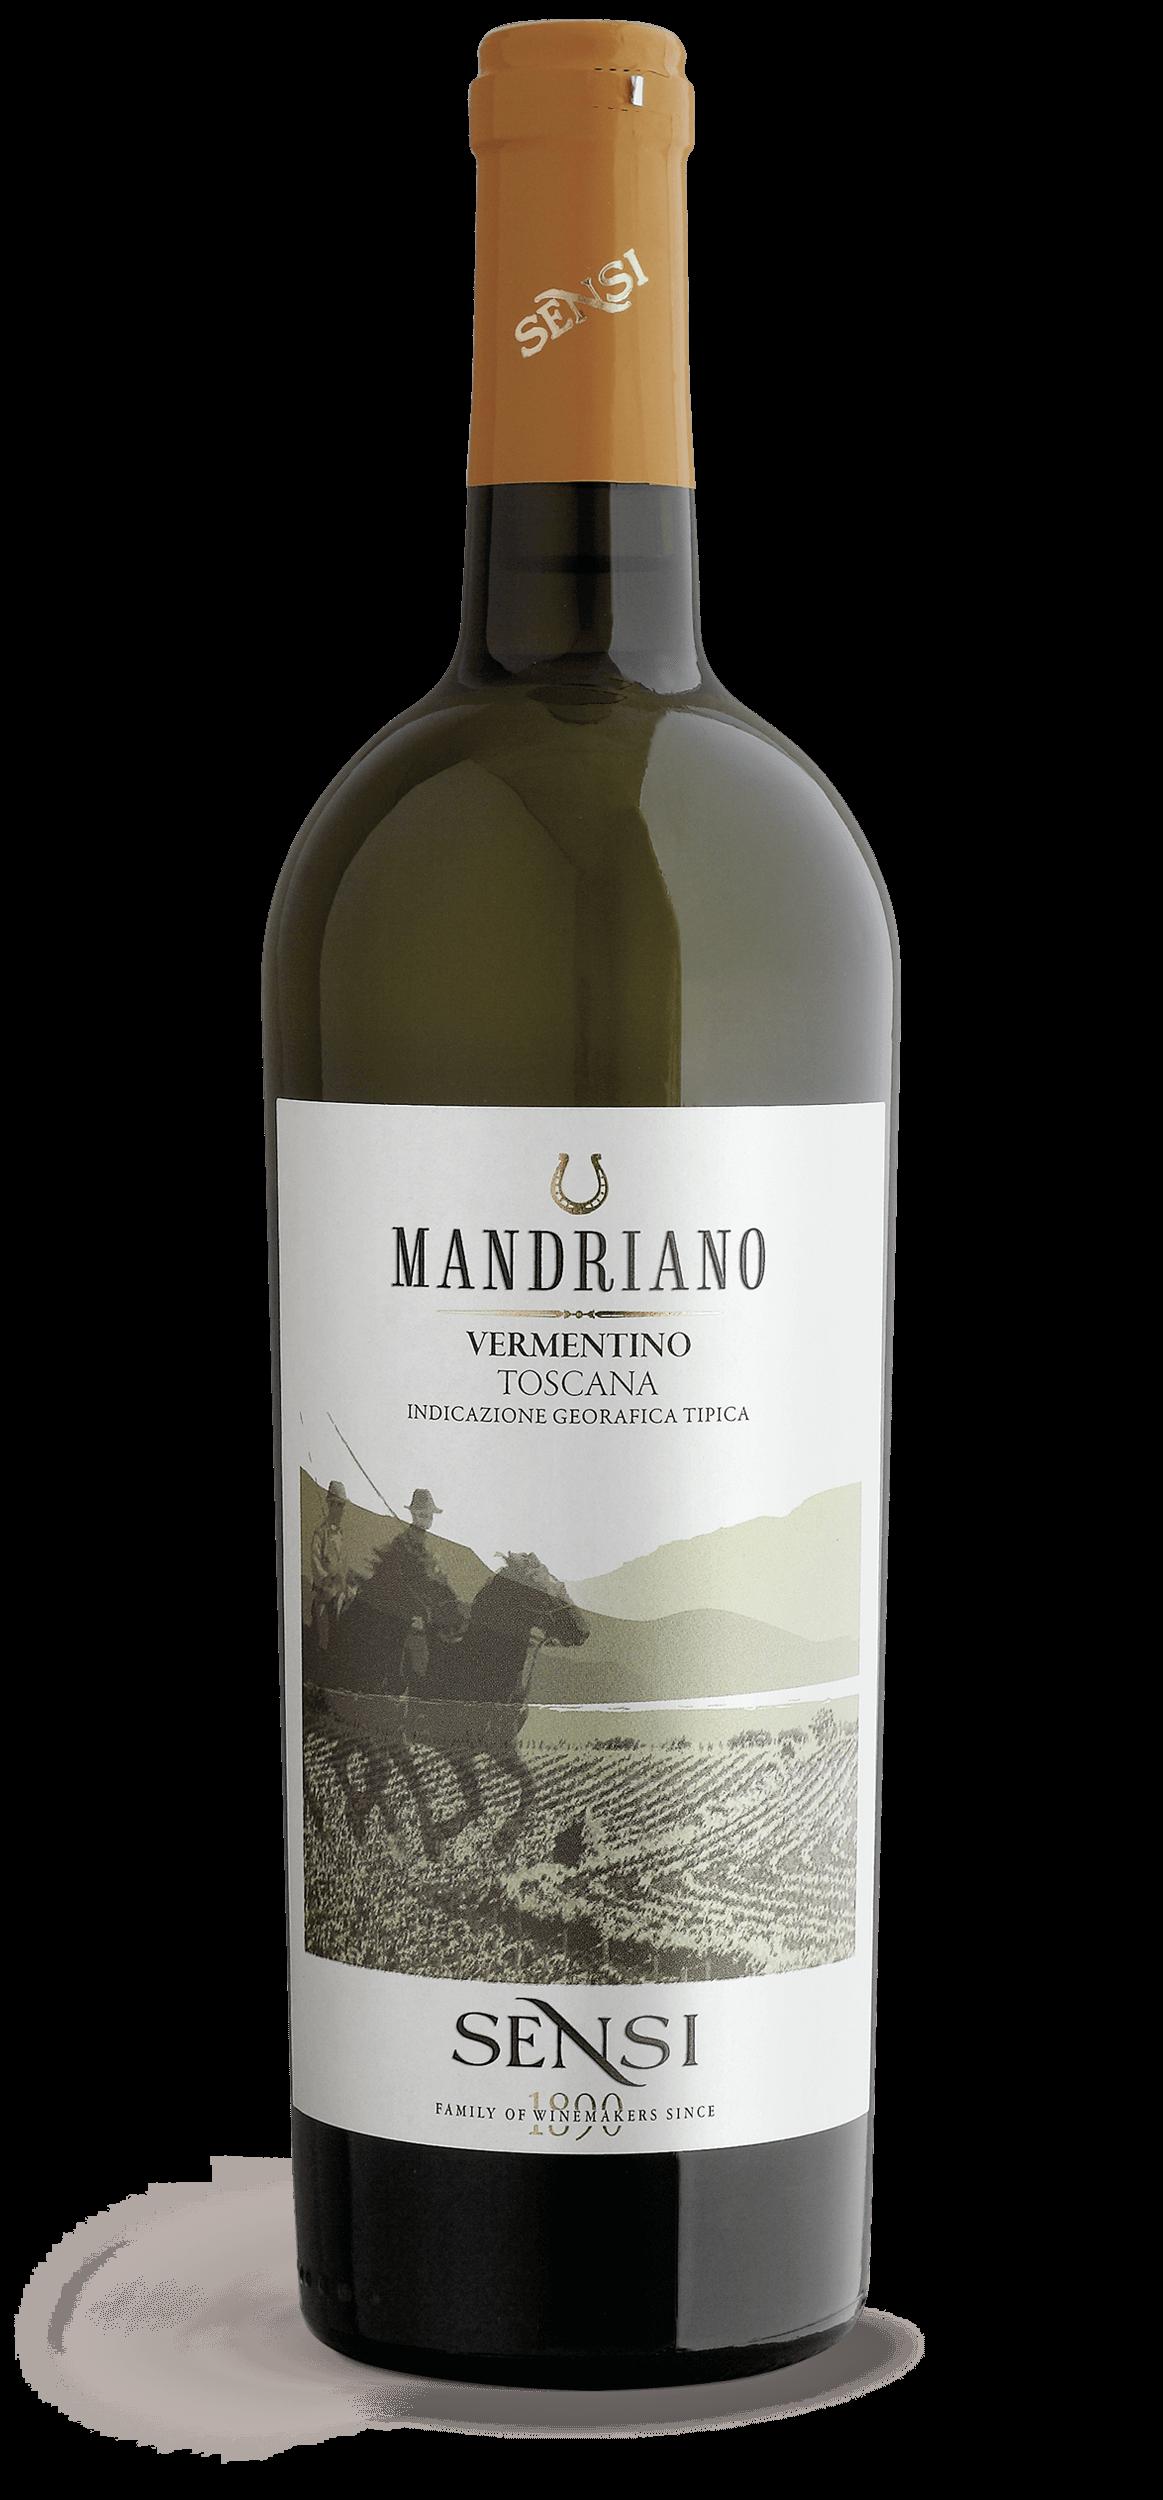 Toscana Classica Mandriano